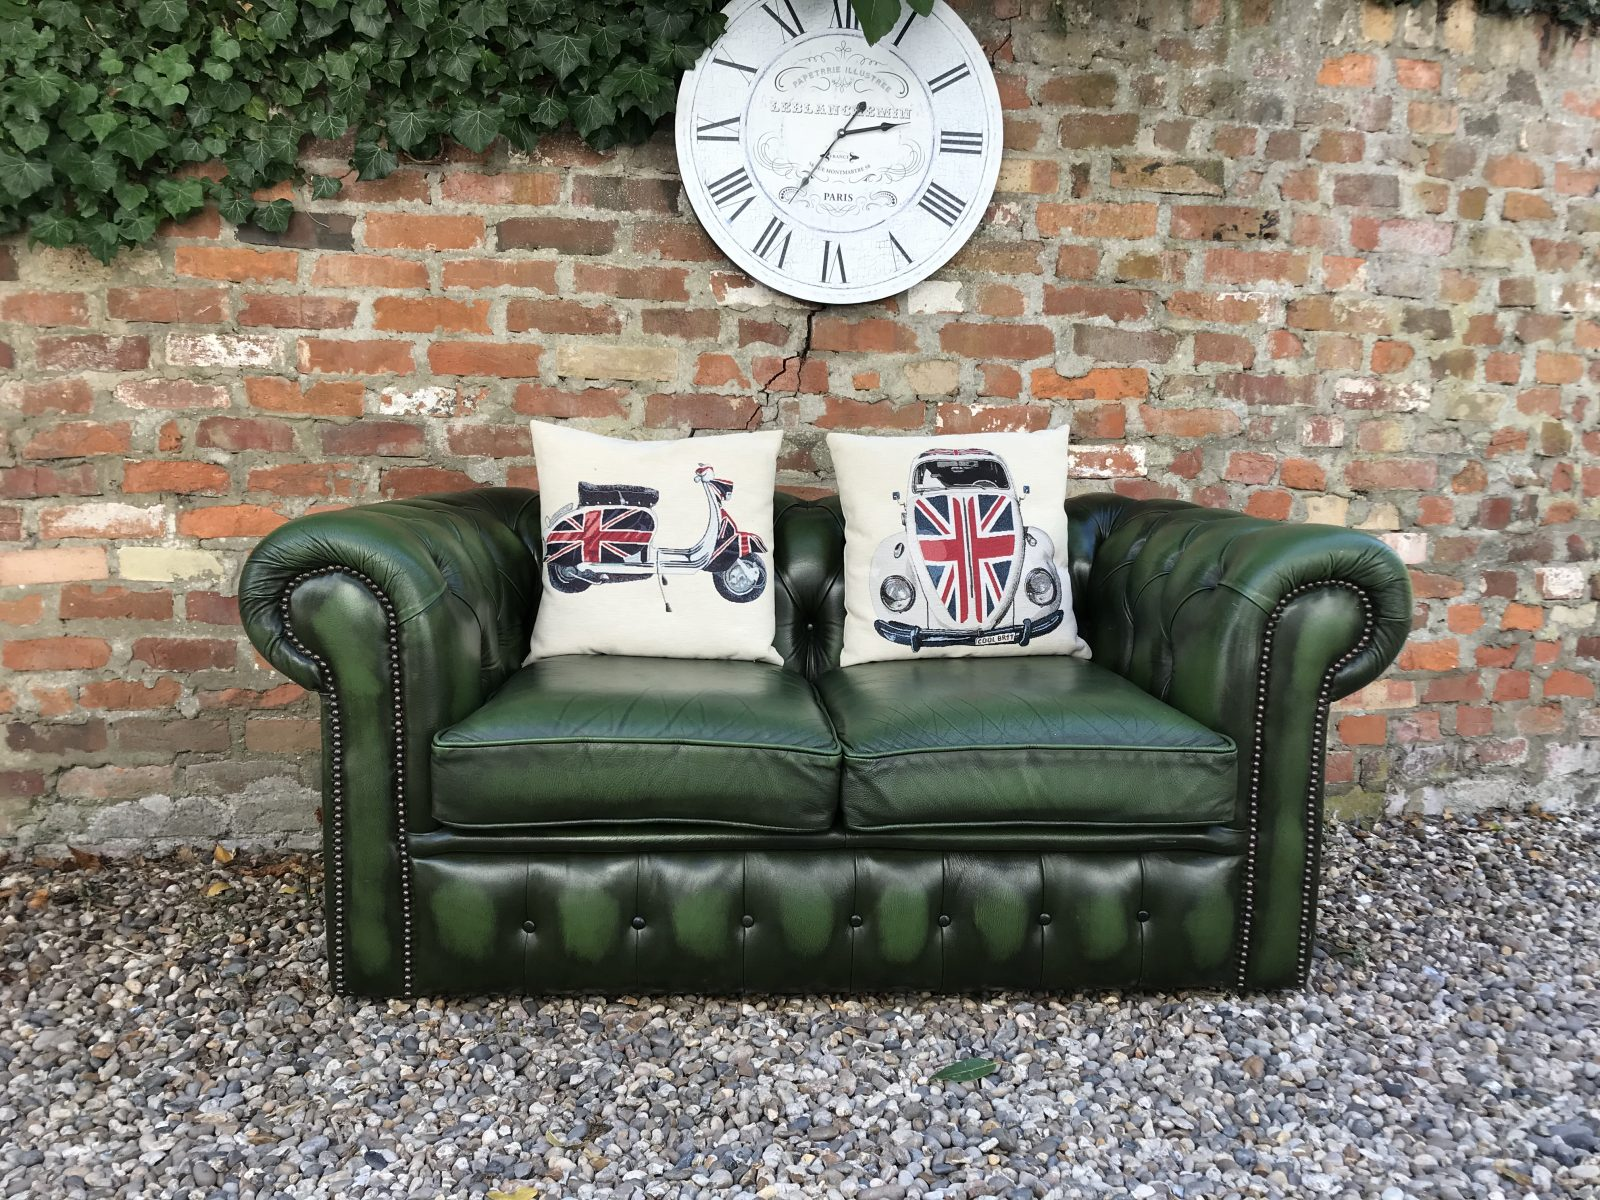 Hunter Green Chesterfield Sofa.